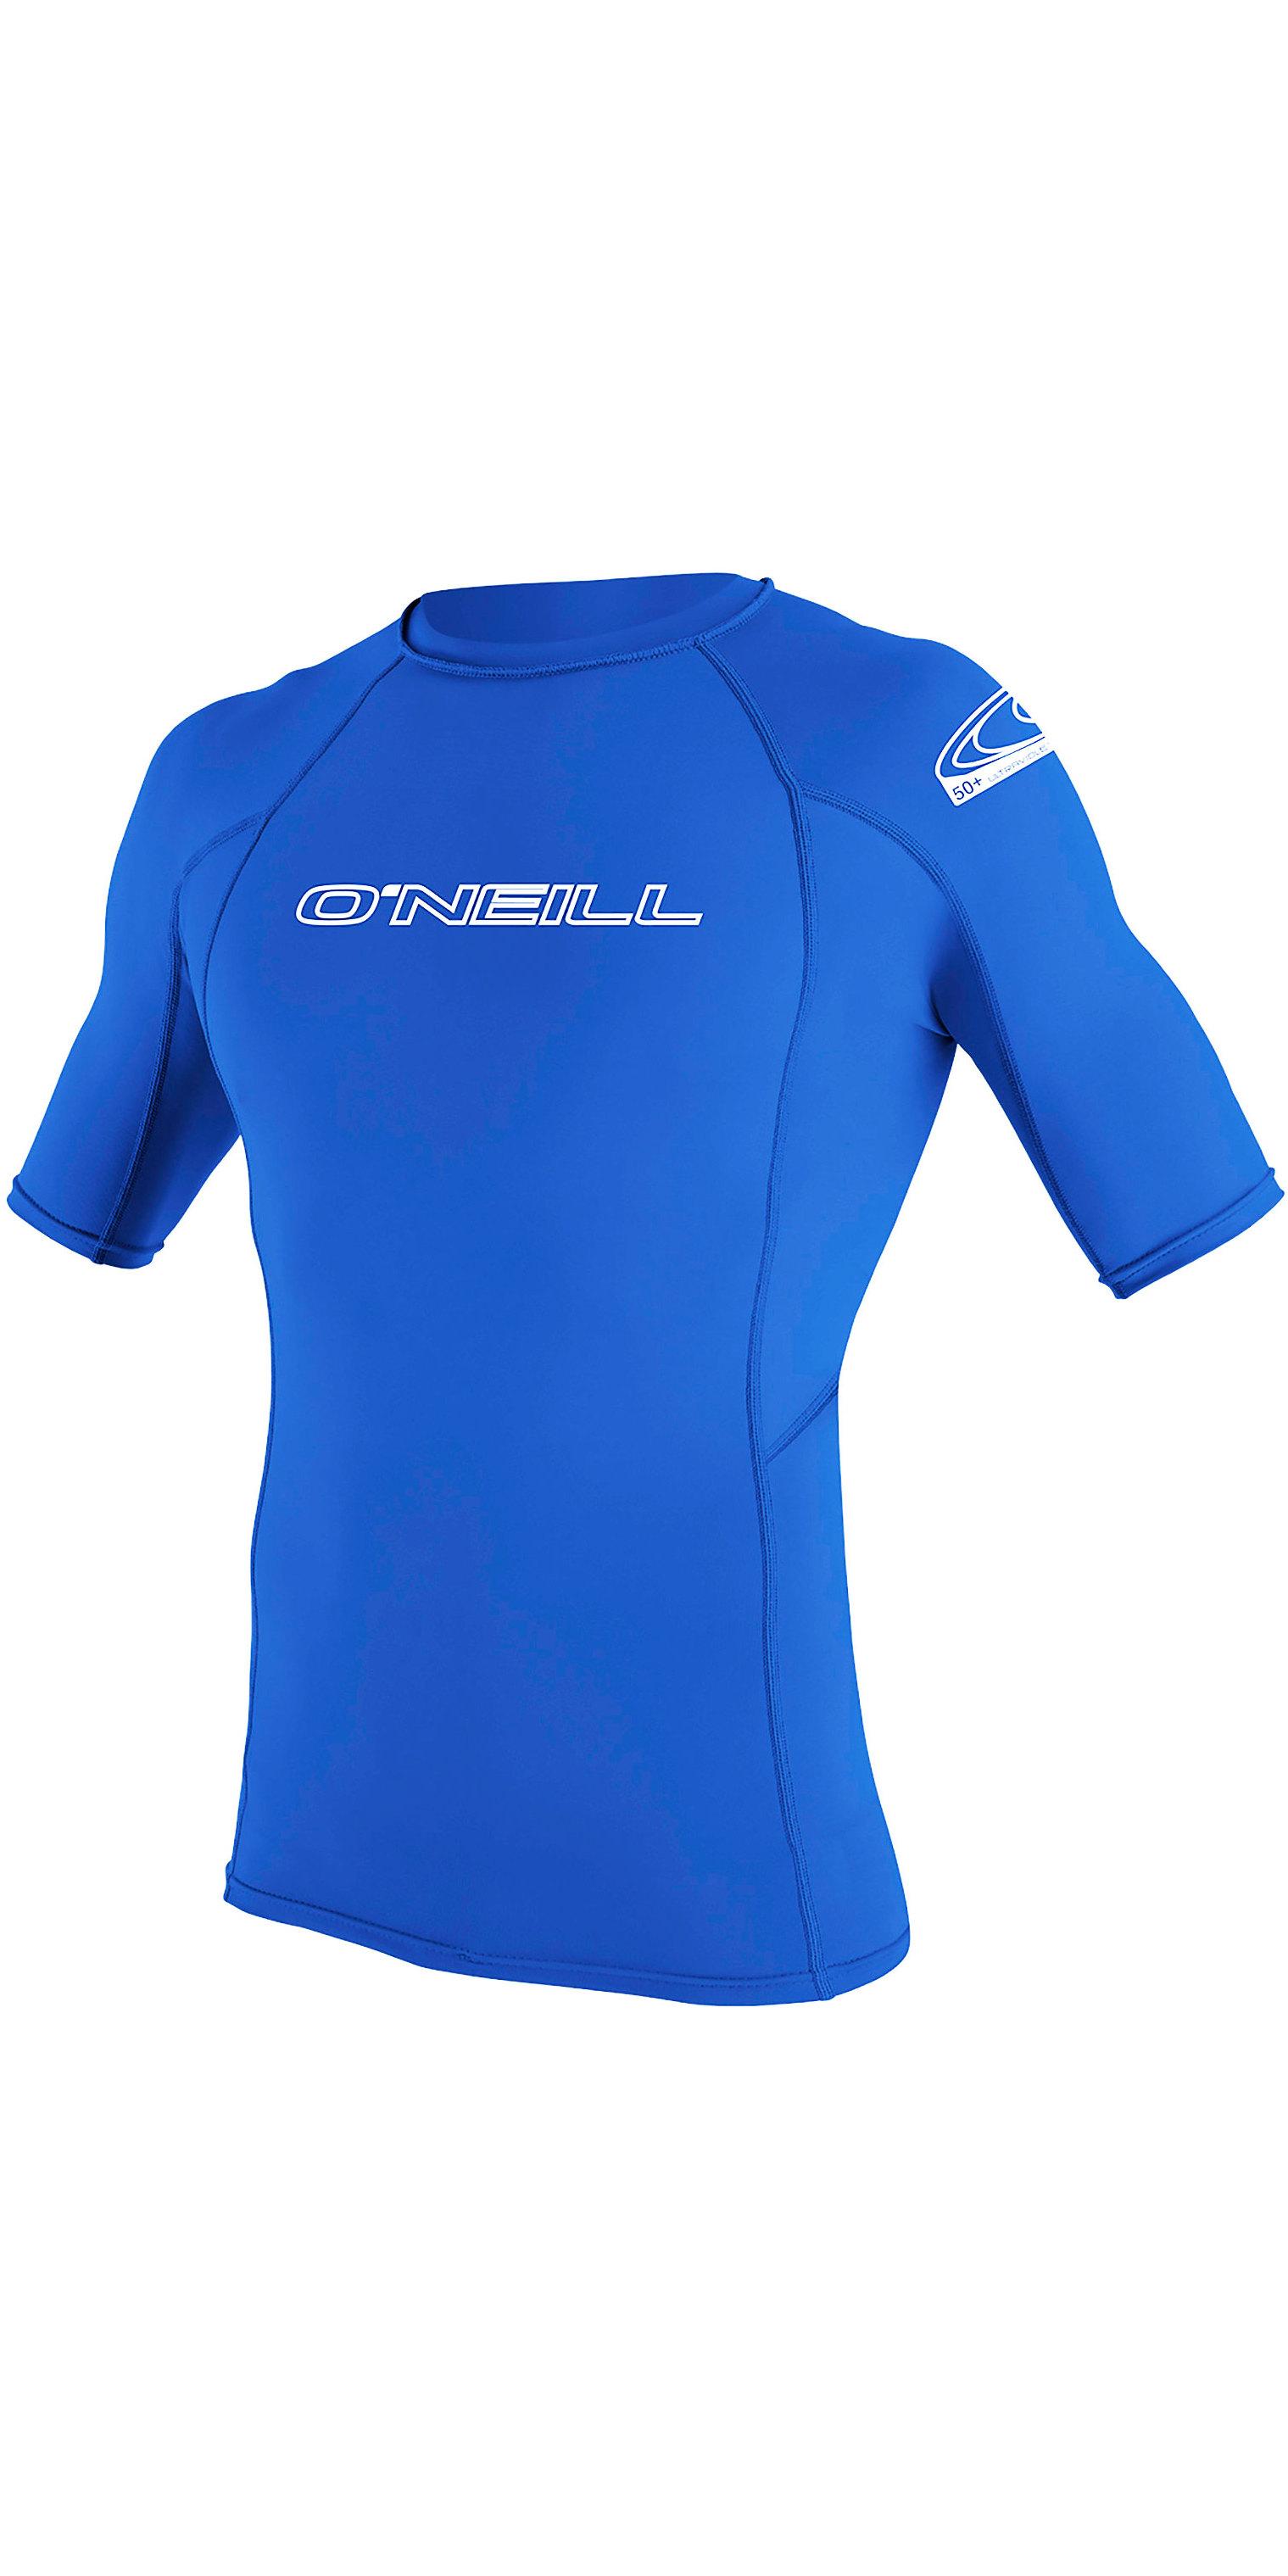 2019 O'Neill Basic Skins Short Sleeve Crew Rash Vest PACIFIC 3341